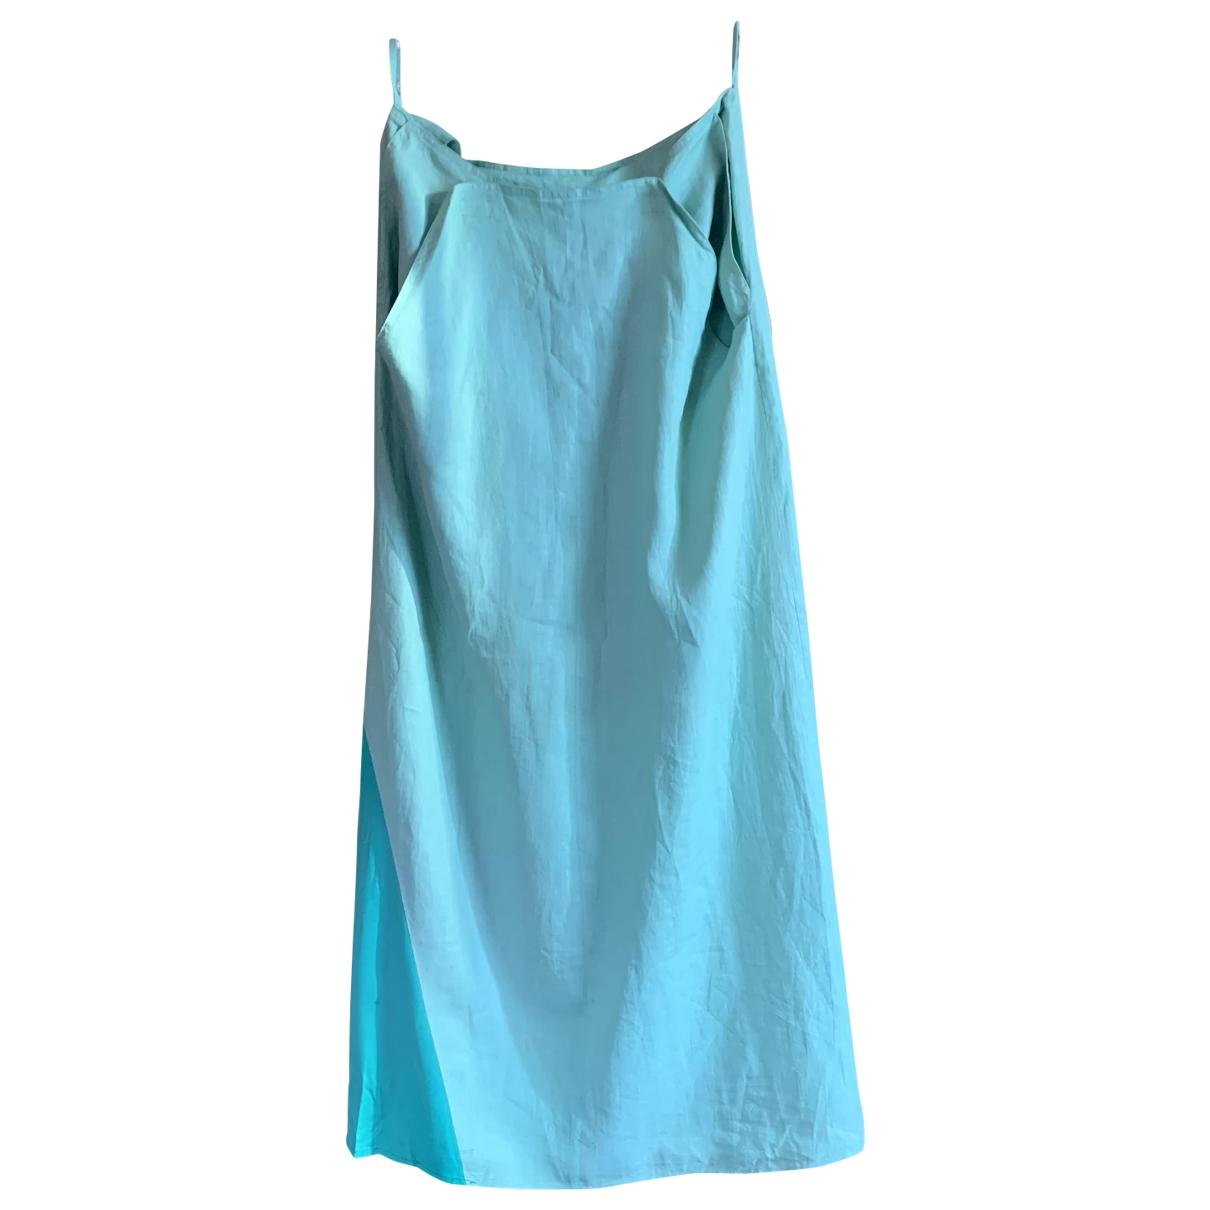 Marni - Jupe   pour femme en lin - vert